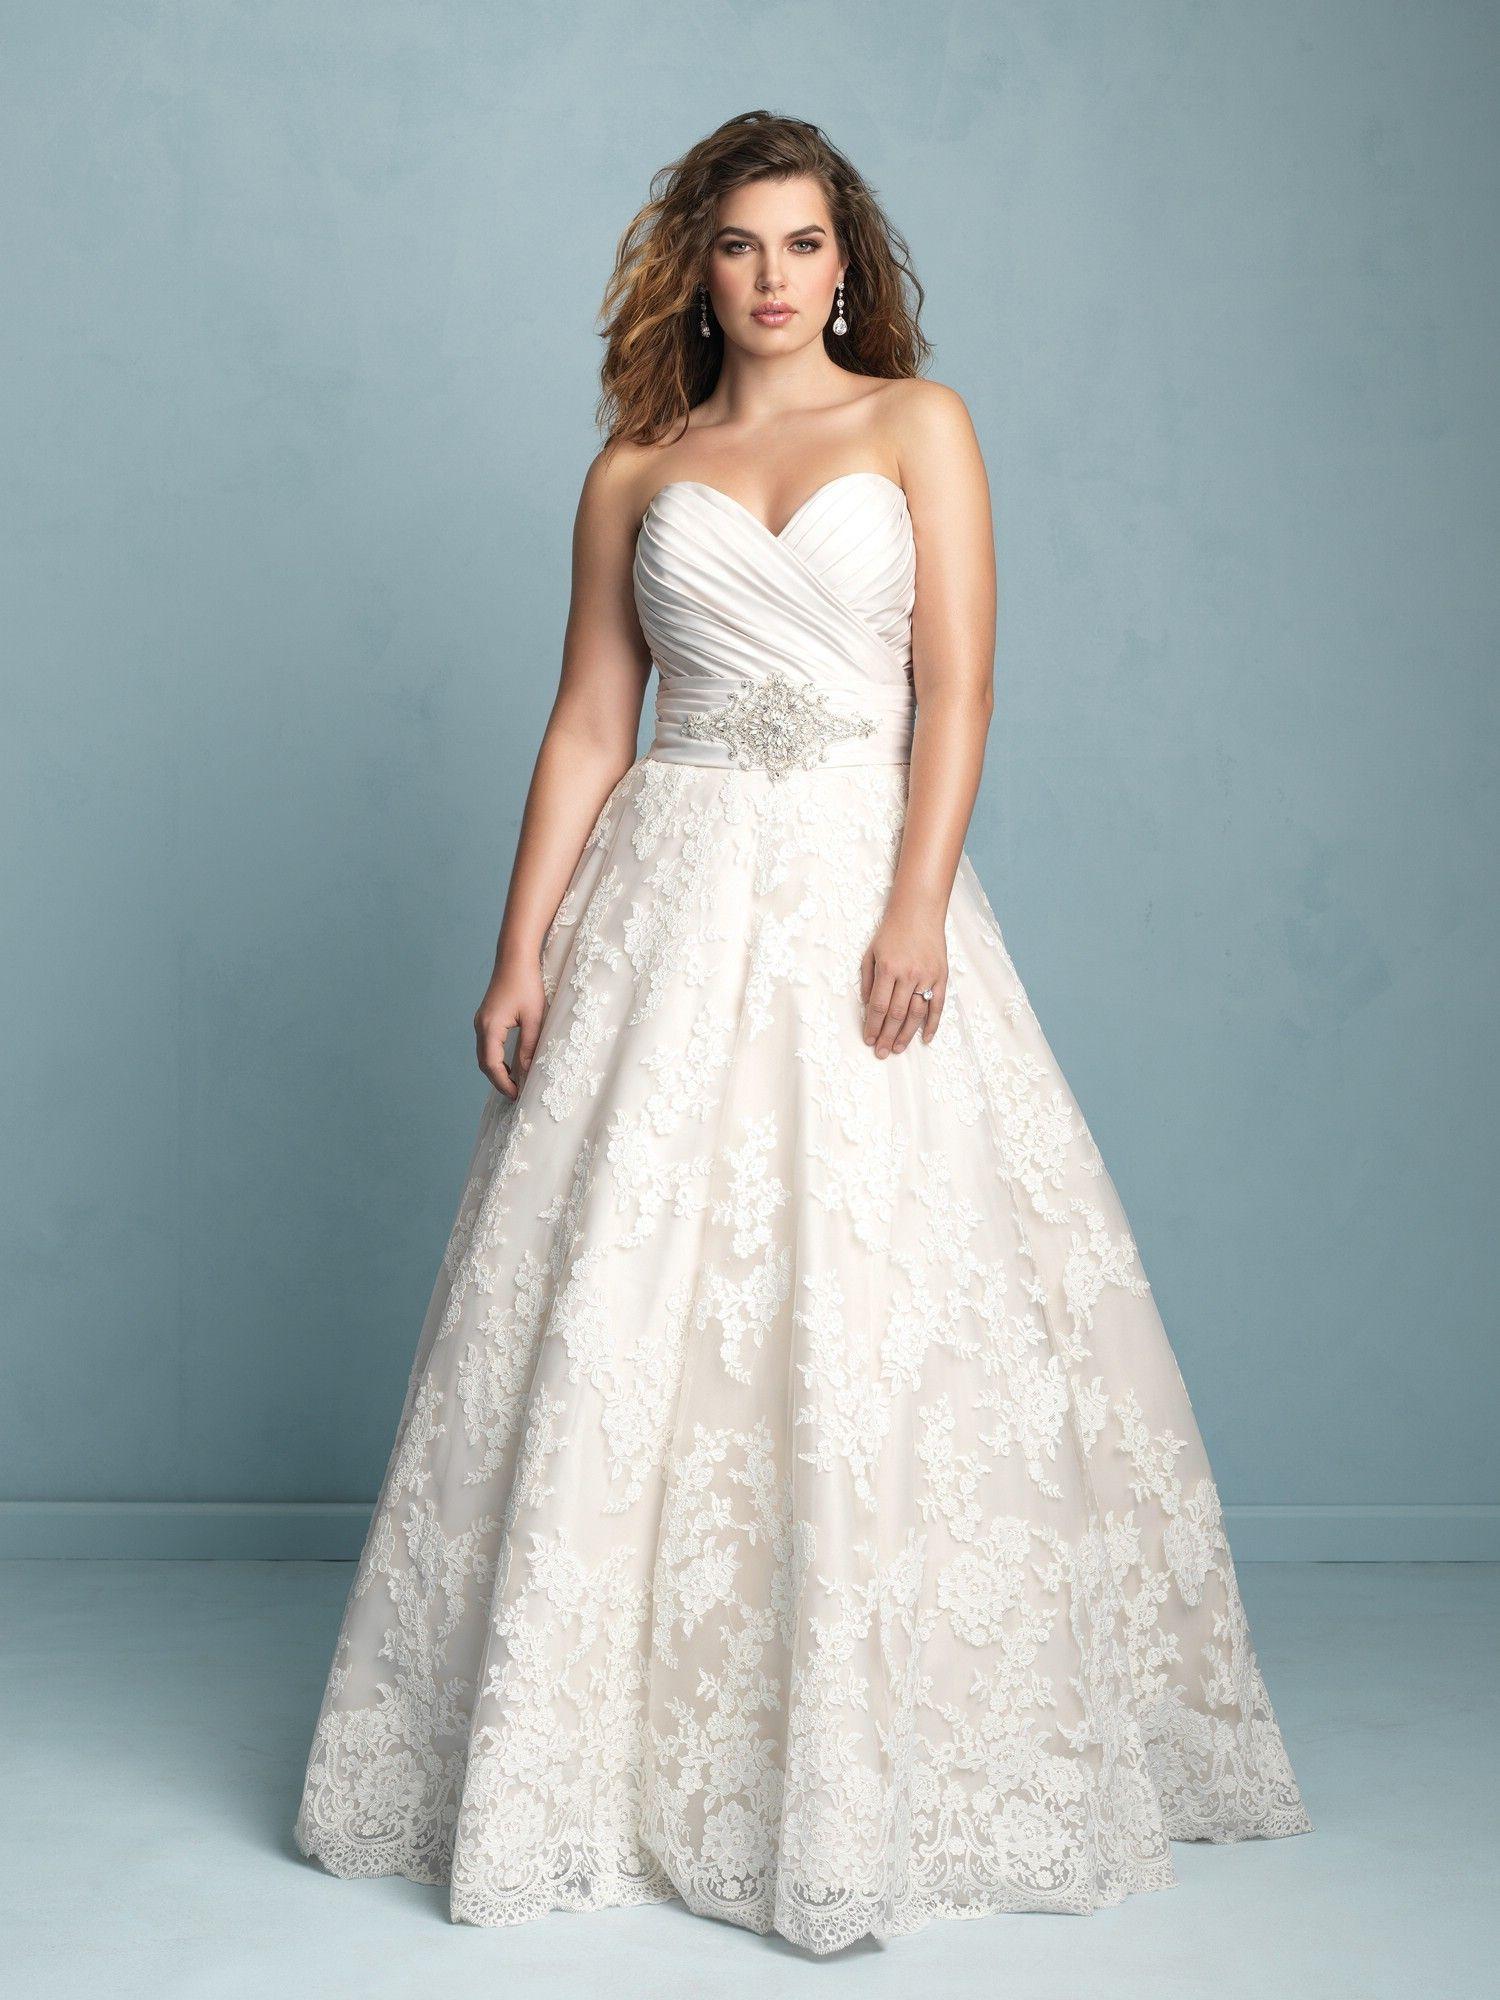 Allure Women Wedding Dresses - Style W351 [W351] : Wedding Dresses ...